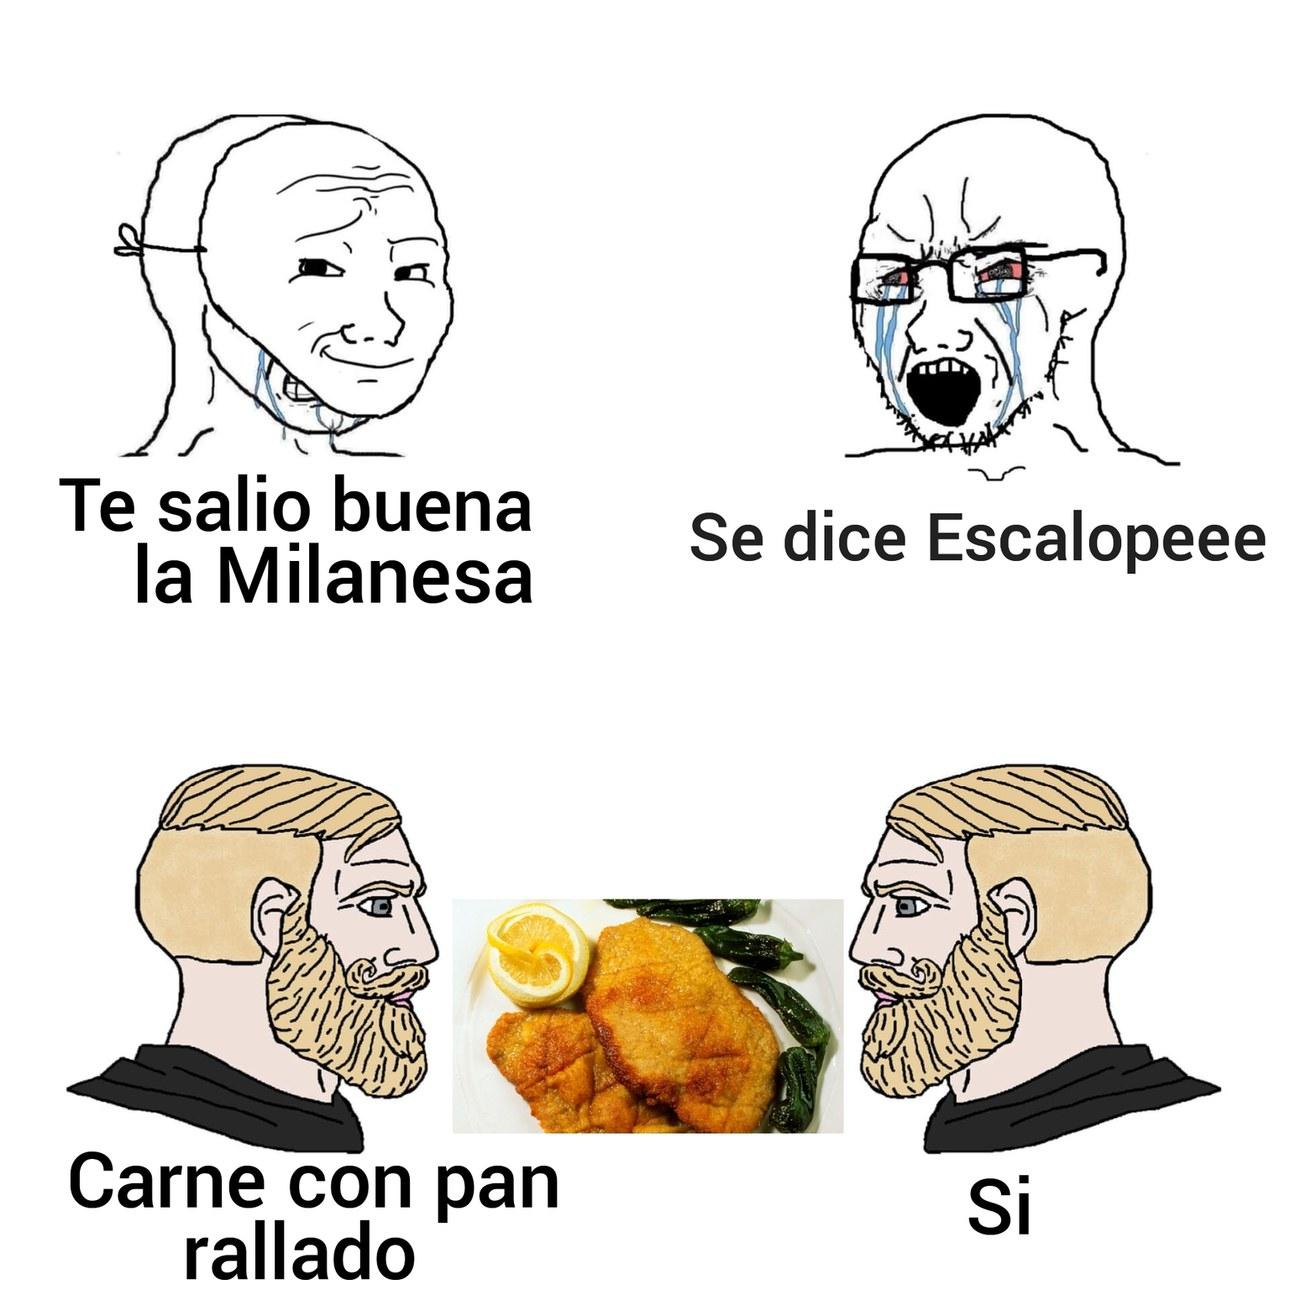 MMM CARNE CON PAN - meme